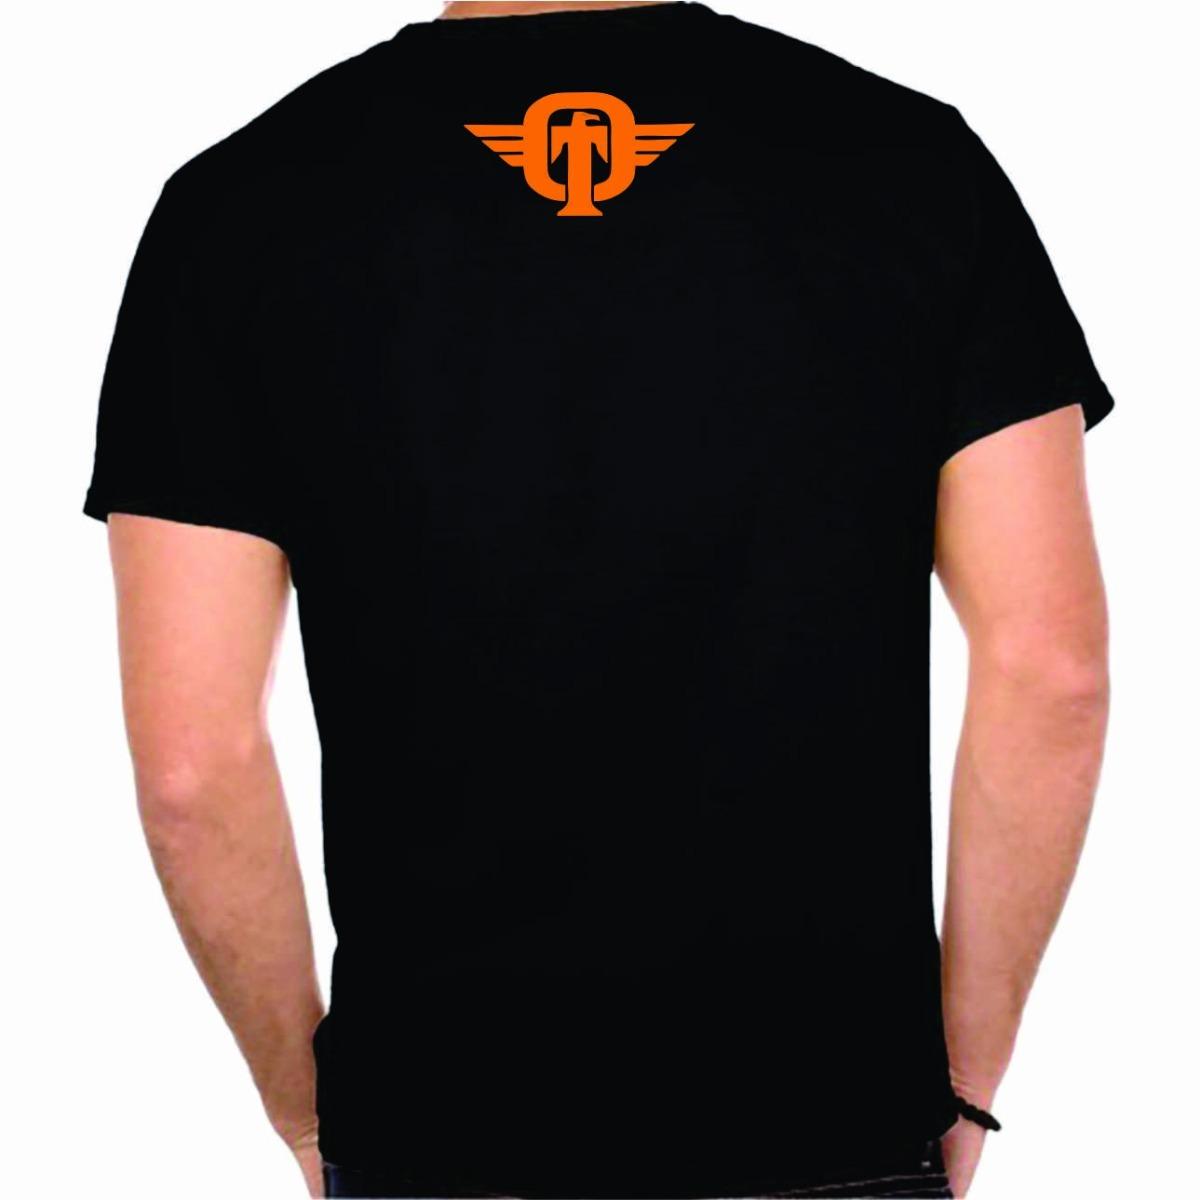 camisa camiseta tapout manga curta jiu jitsu lutas fitness. Carregando zoom. 33876231fdf24